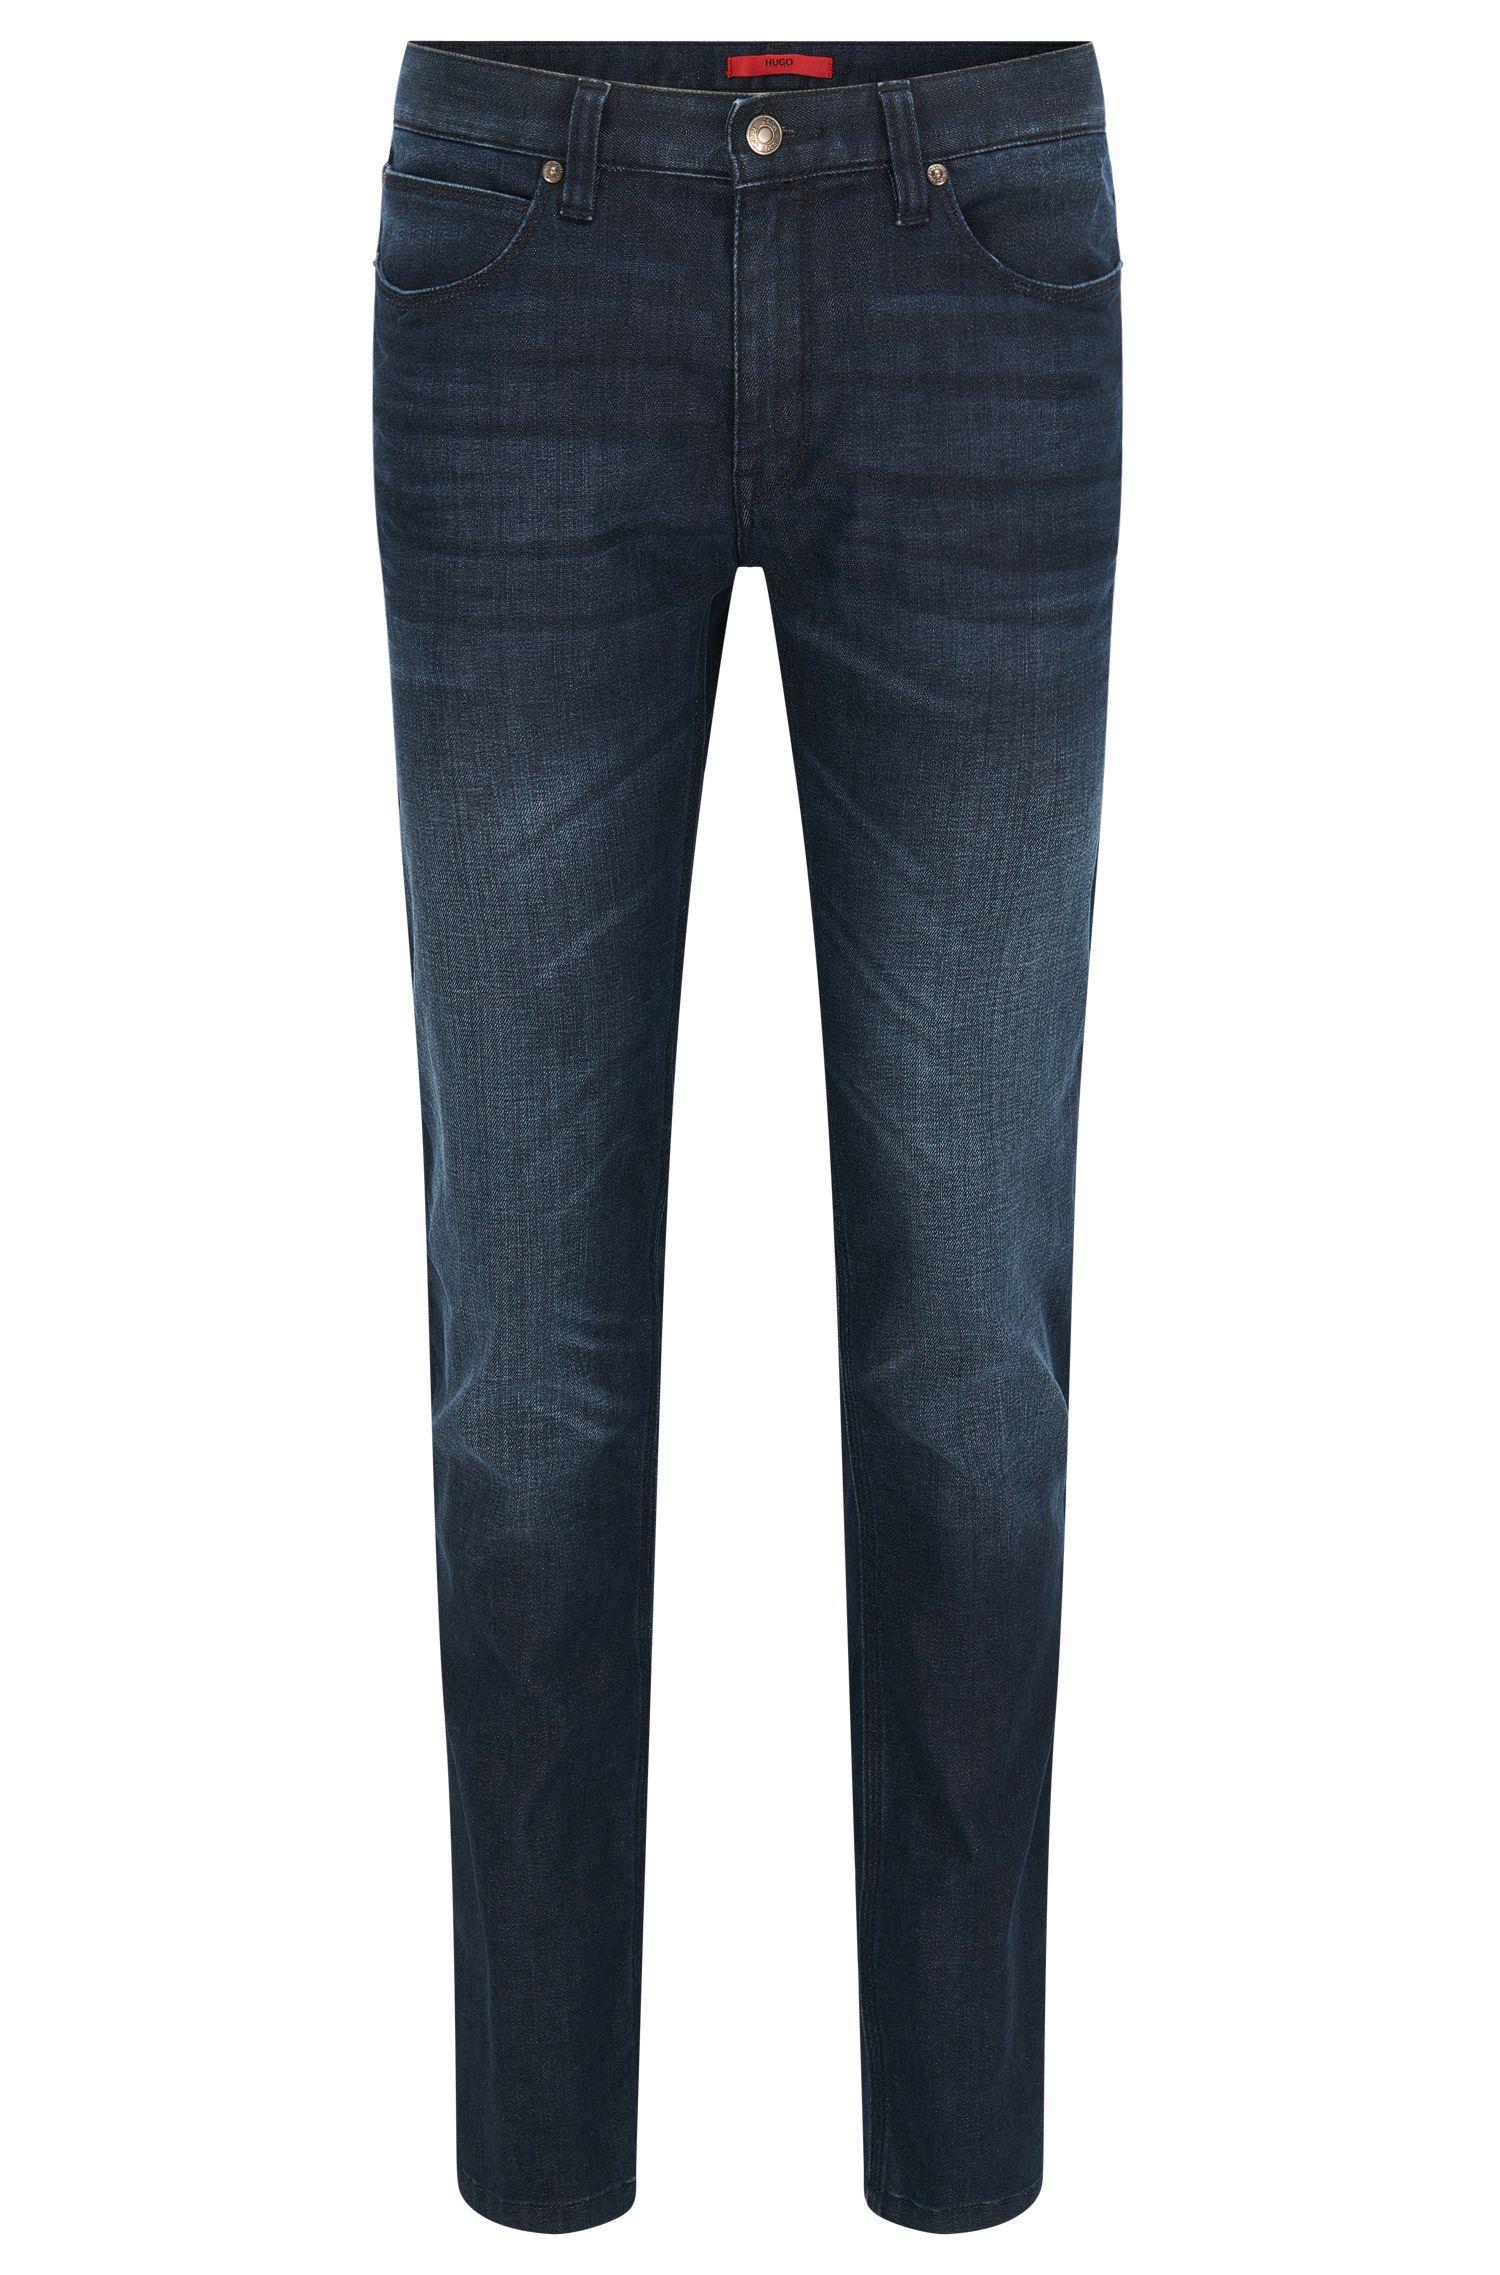 Jeans HUGO Homme Slim Fit en denim stretch StoneWash